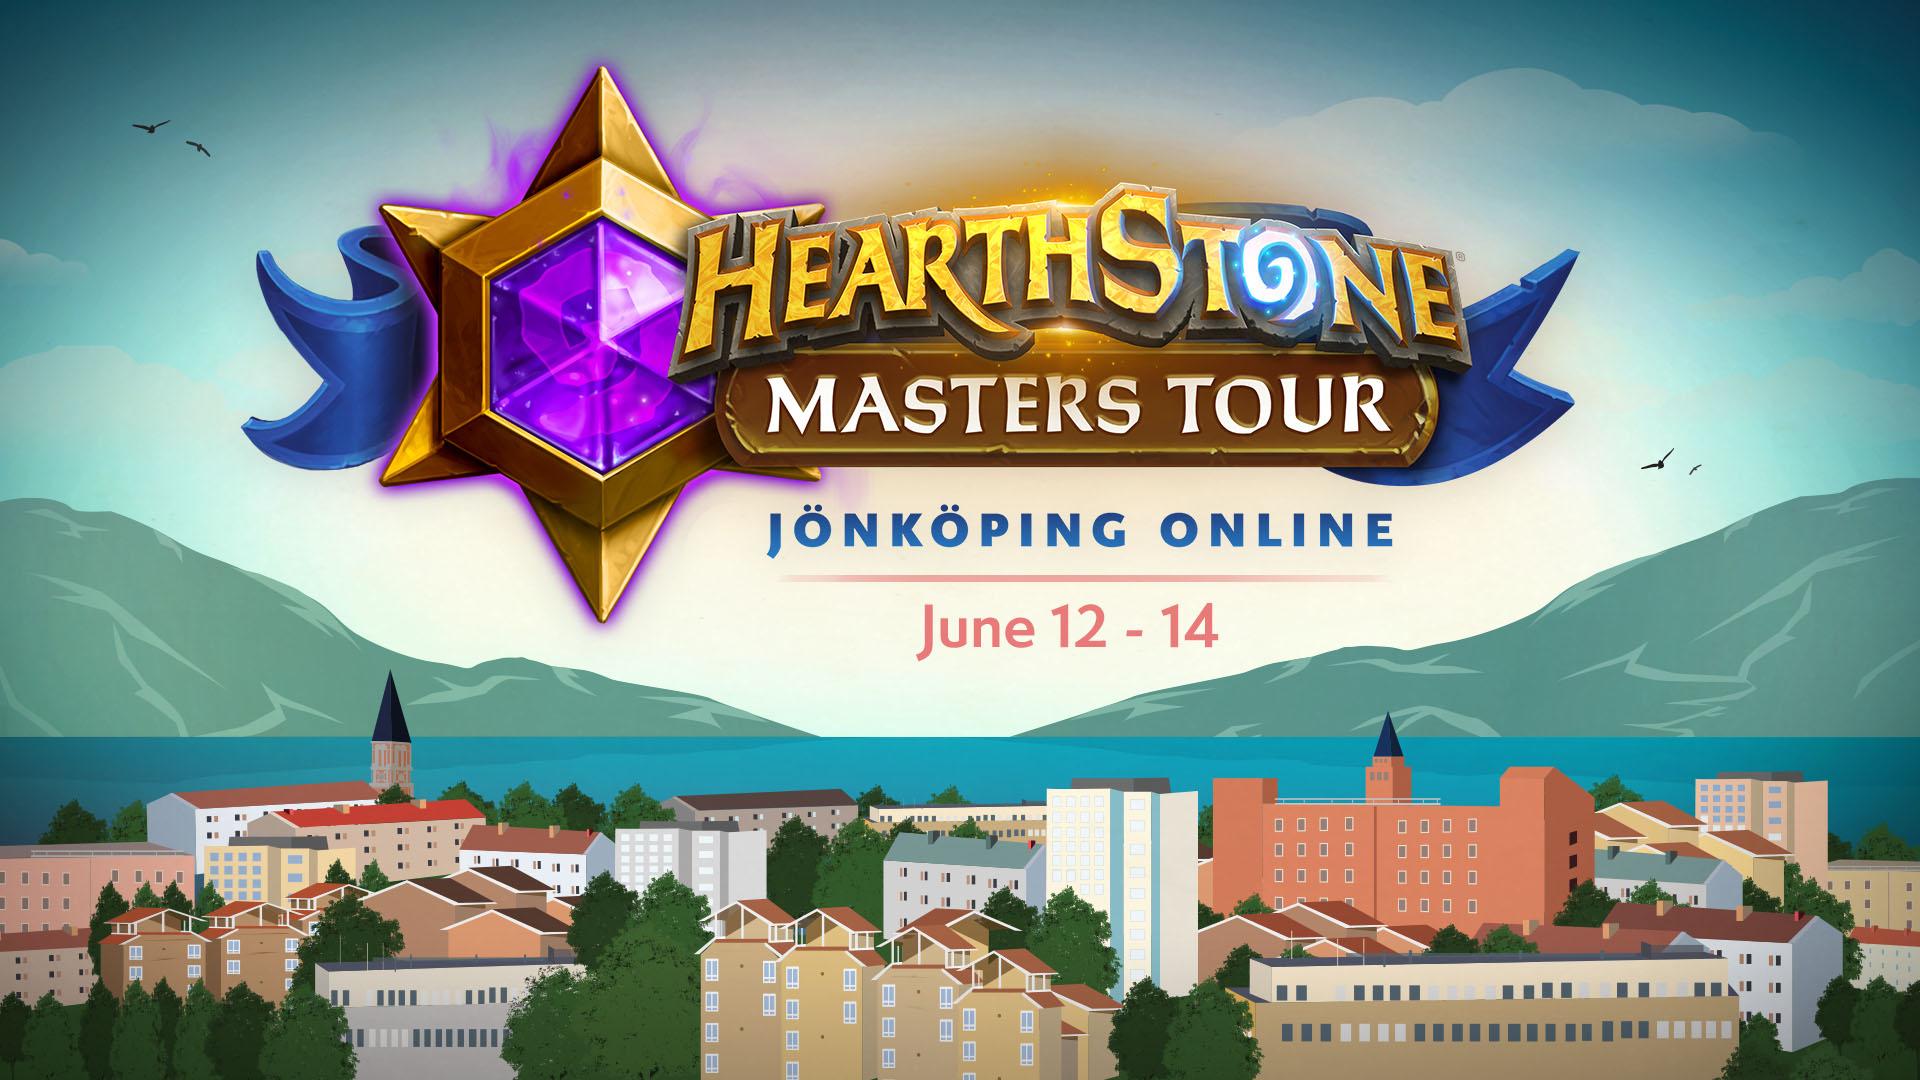 Masters Tour Online: Jönköping Viewer's Guide